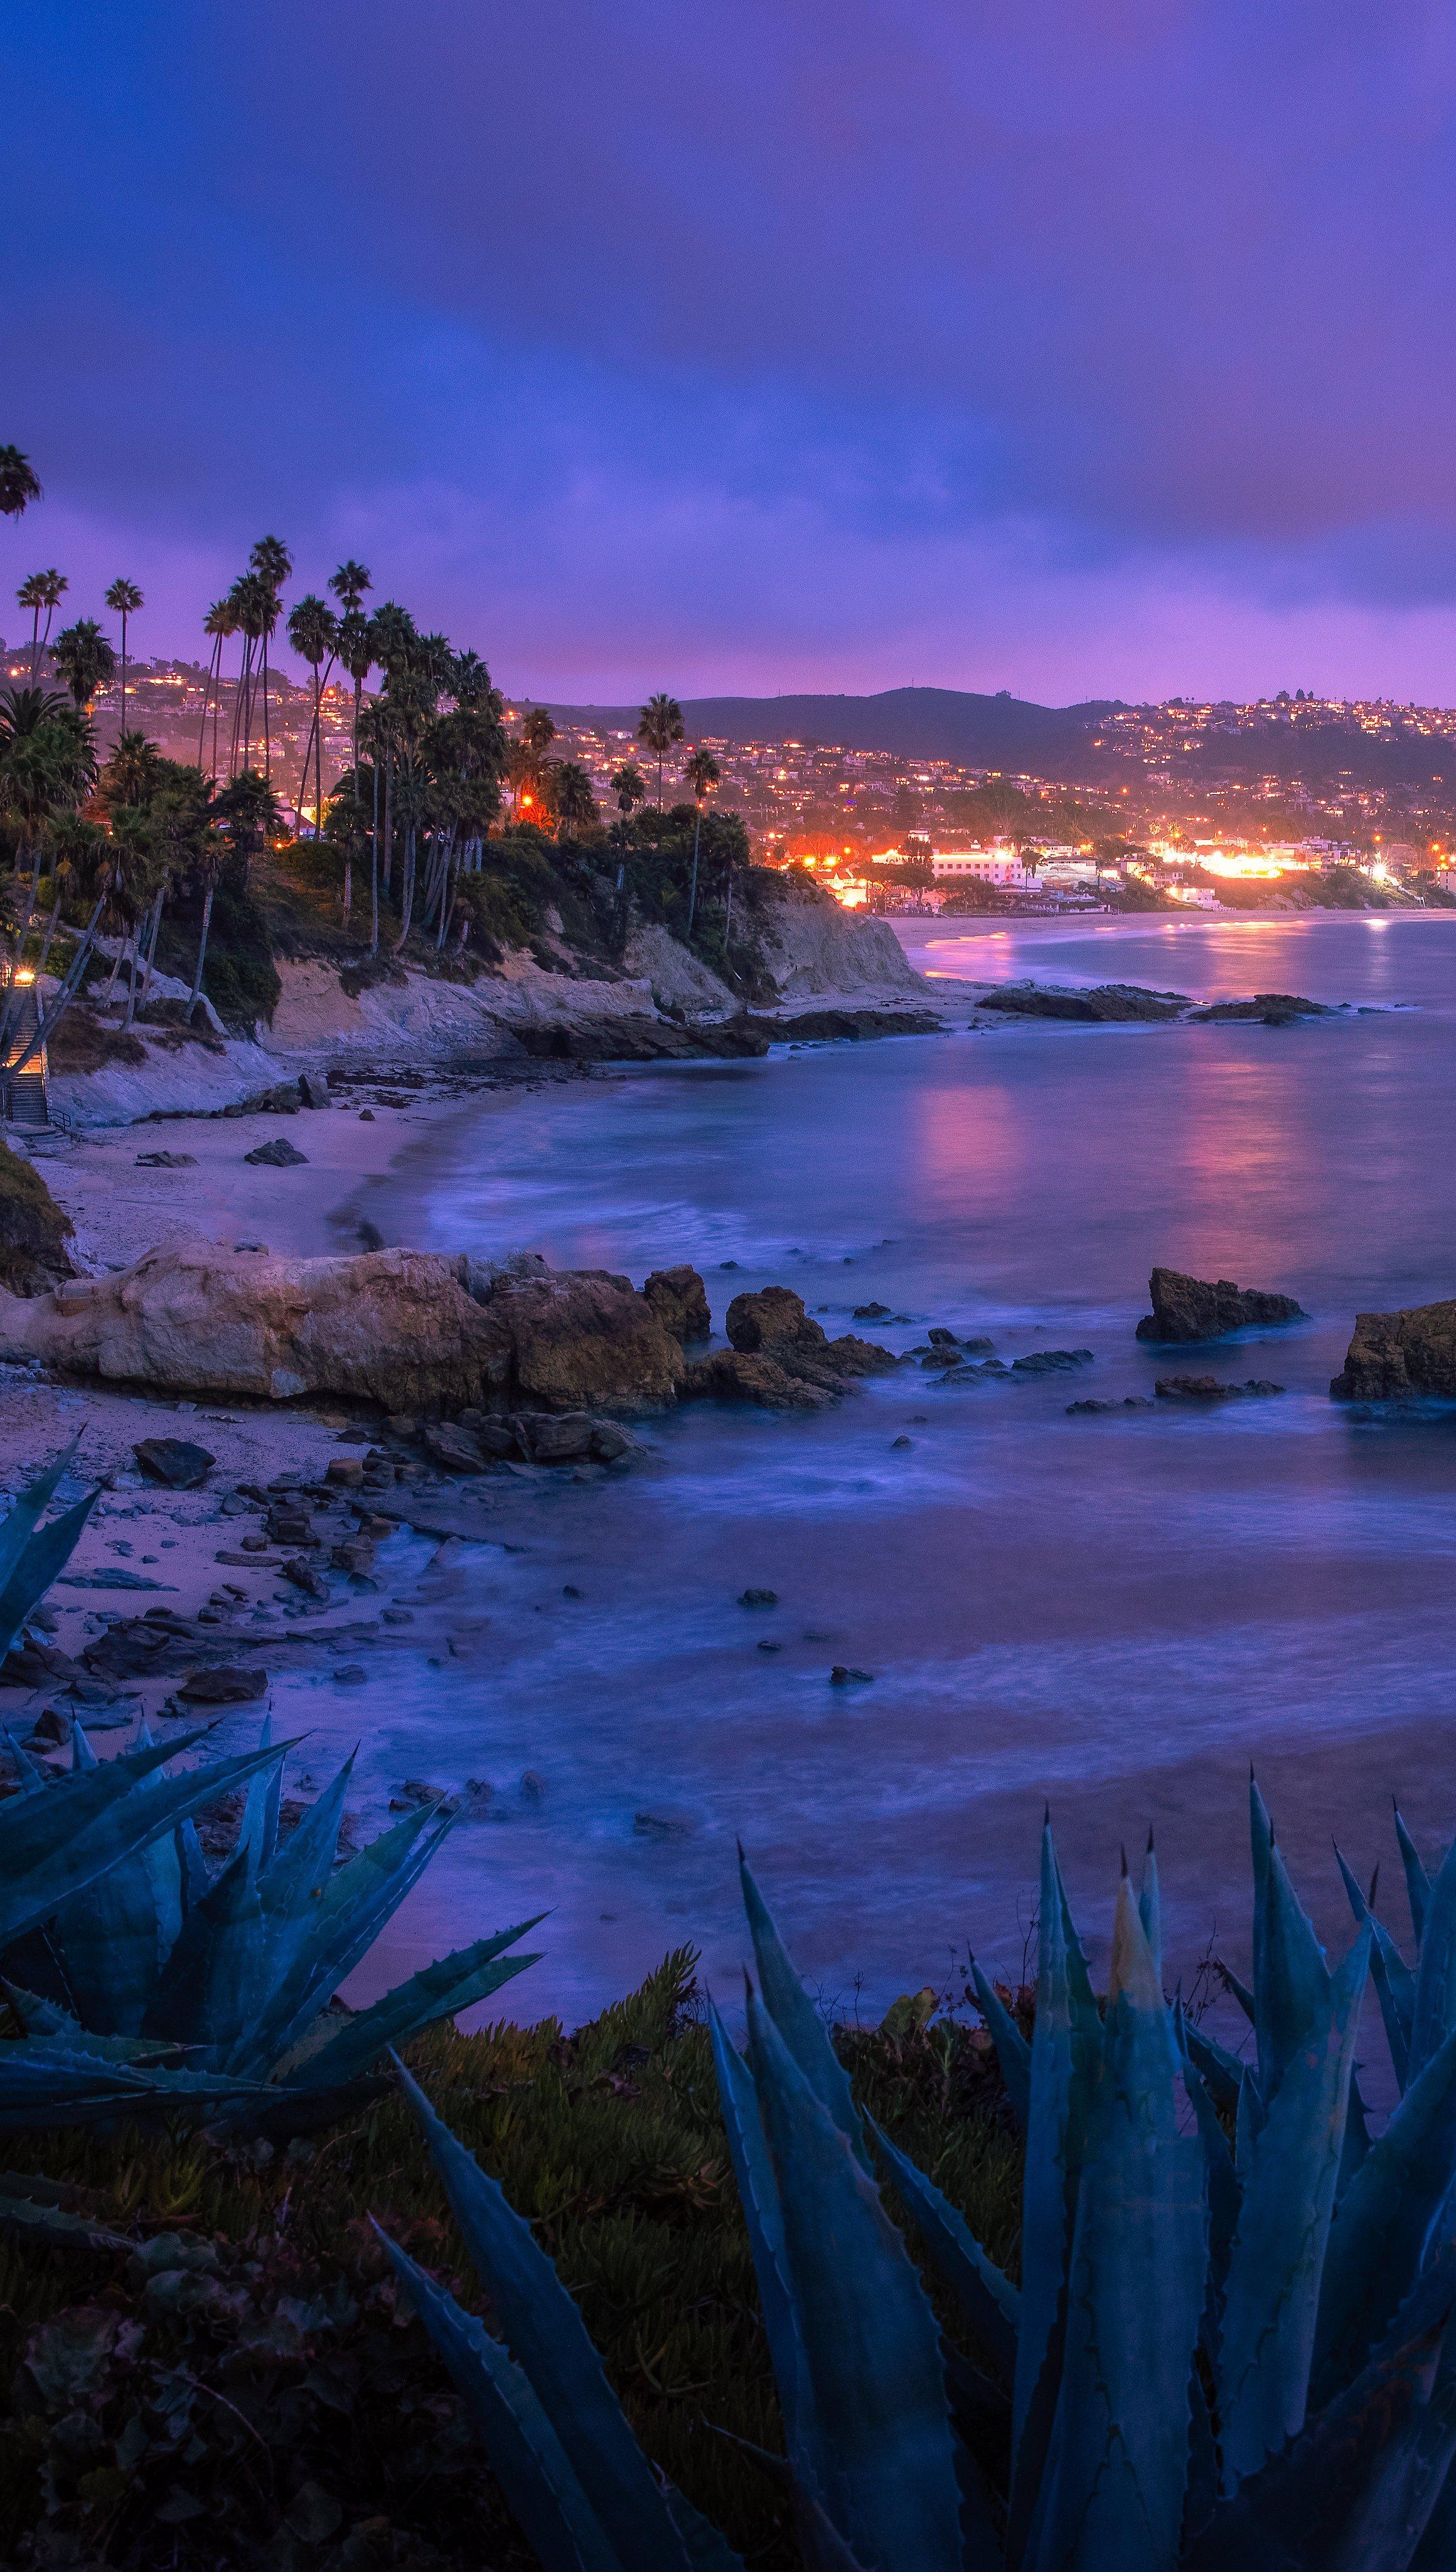 Fondos de pantalla Playa Laguna en Orange County Vertical